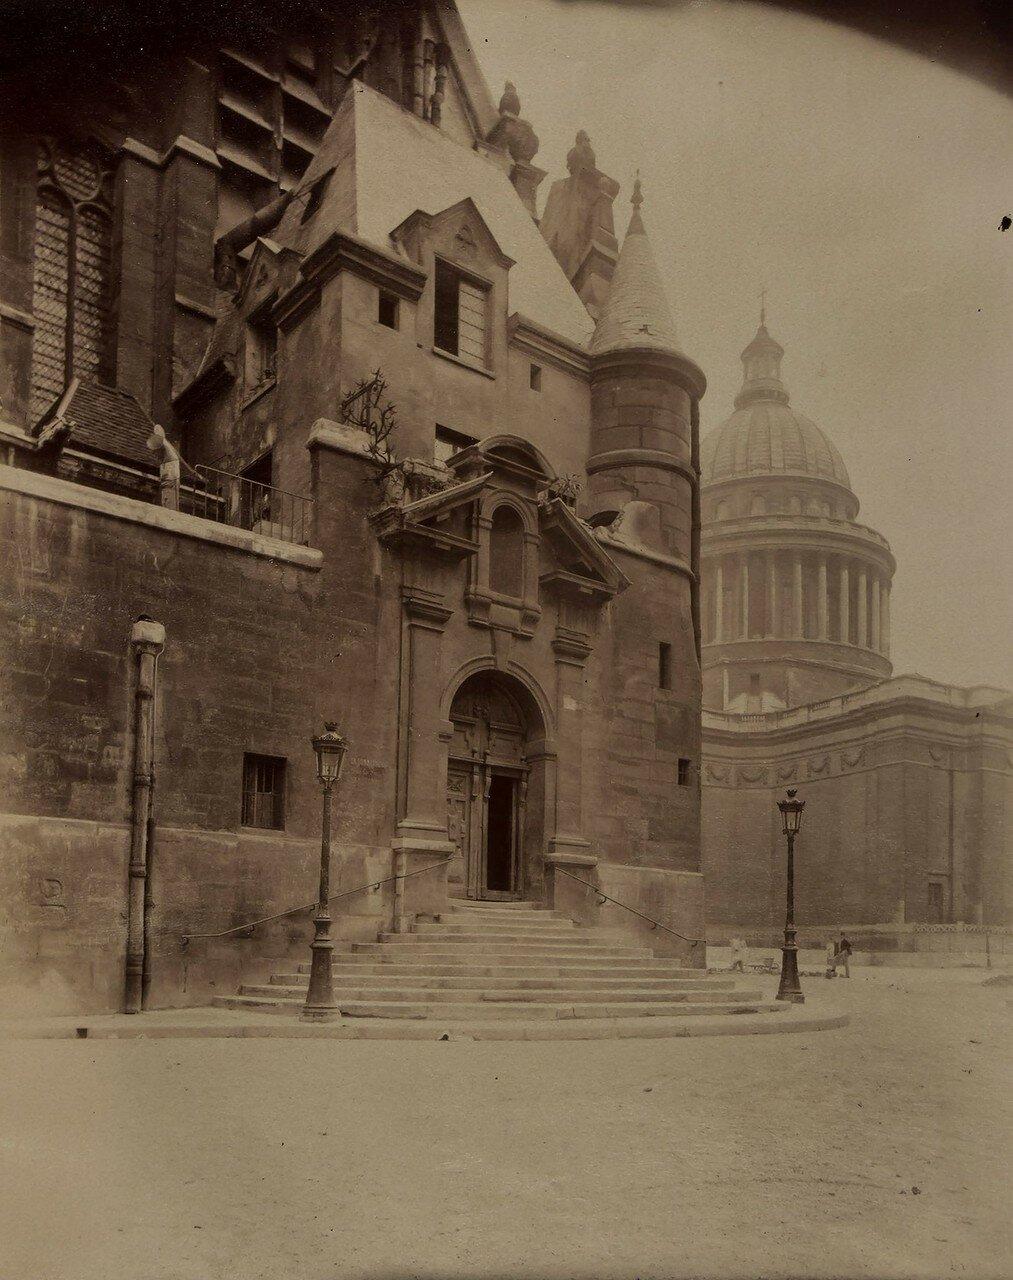 1898. Сент-Этьен-дю-Мон и Пантеон